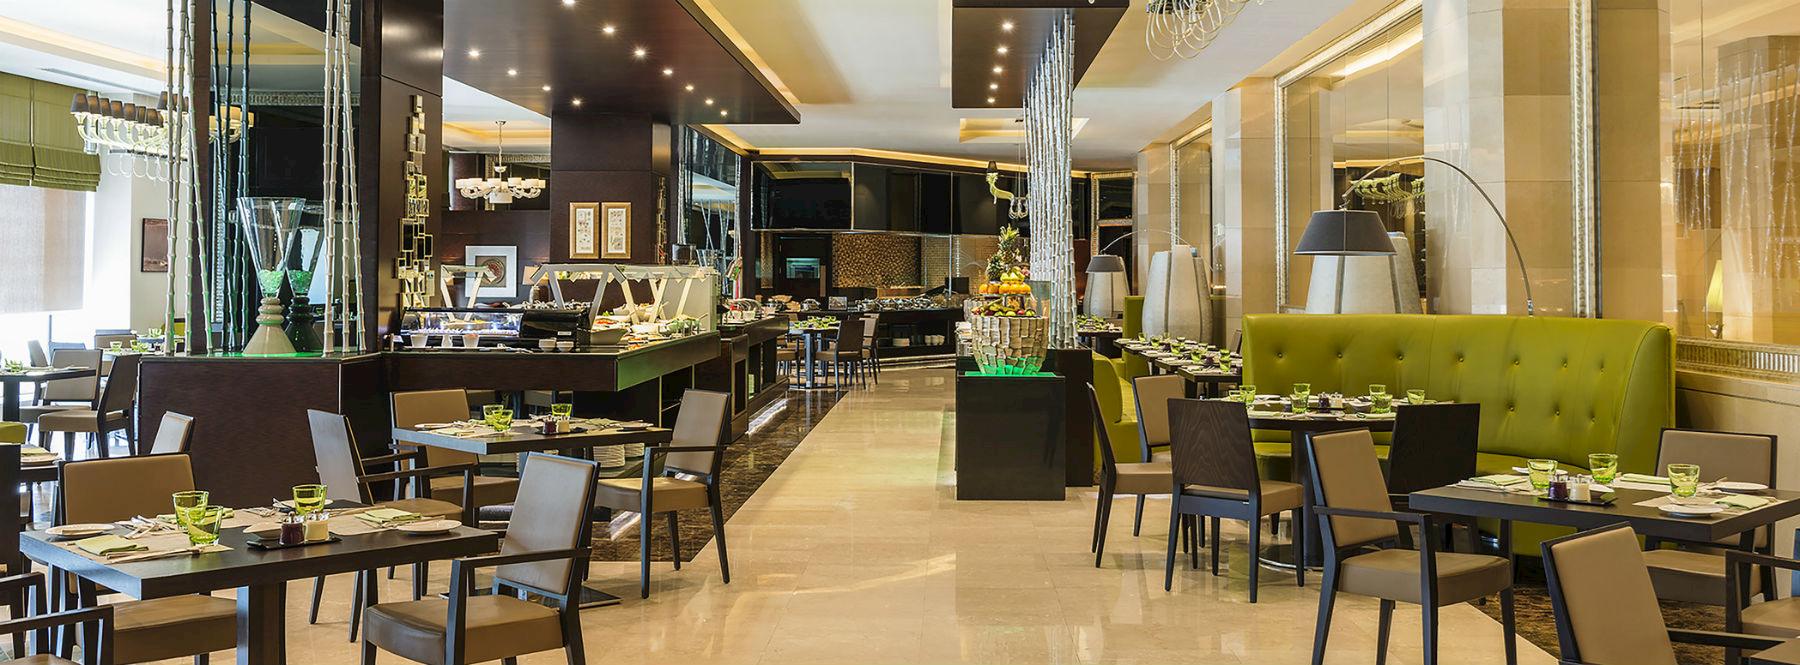 Spice Garden Amman l Multi Cuisine Restaurant